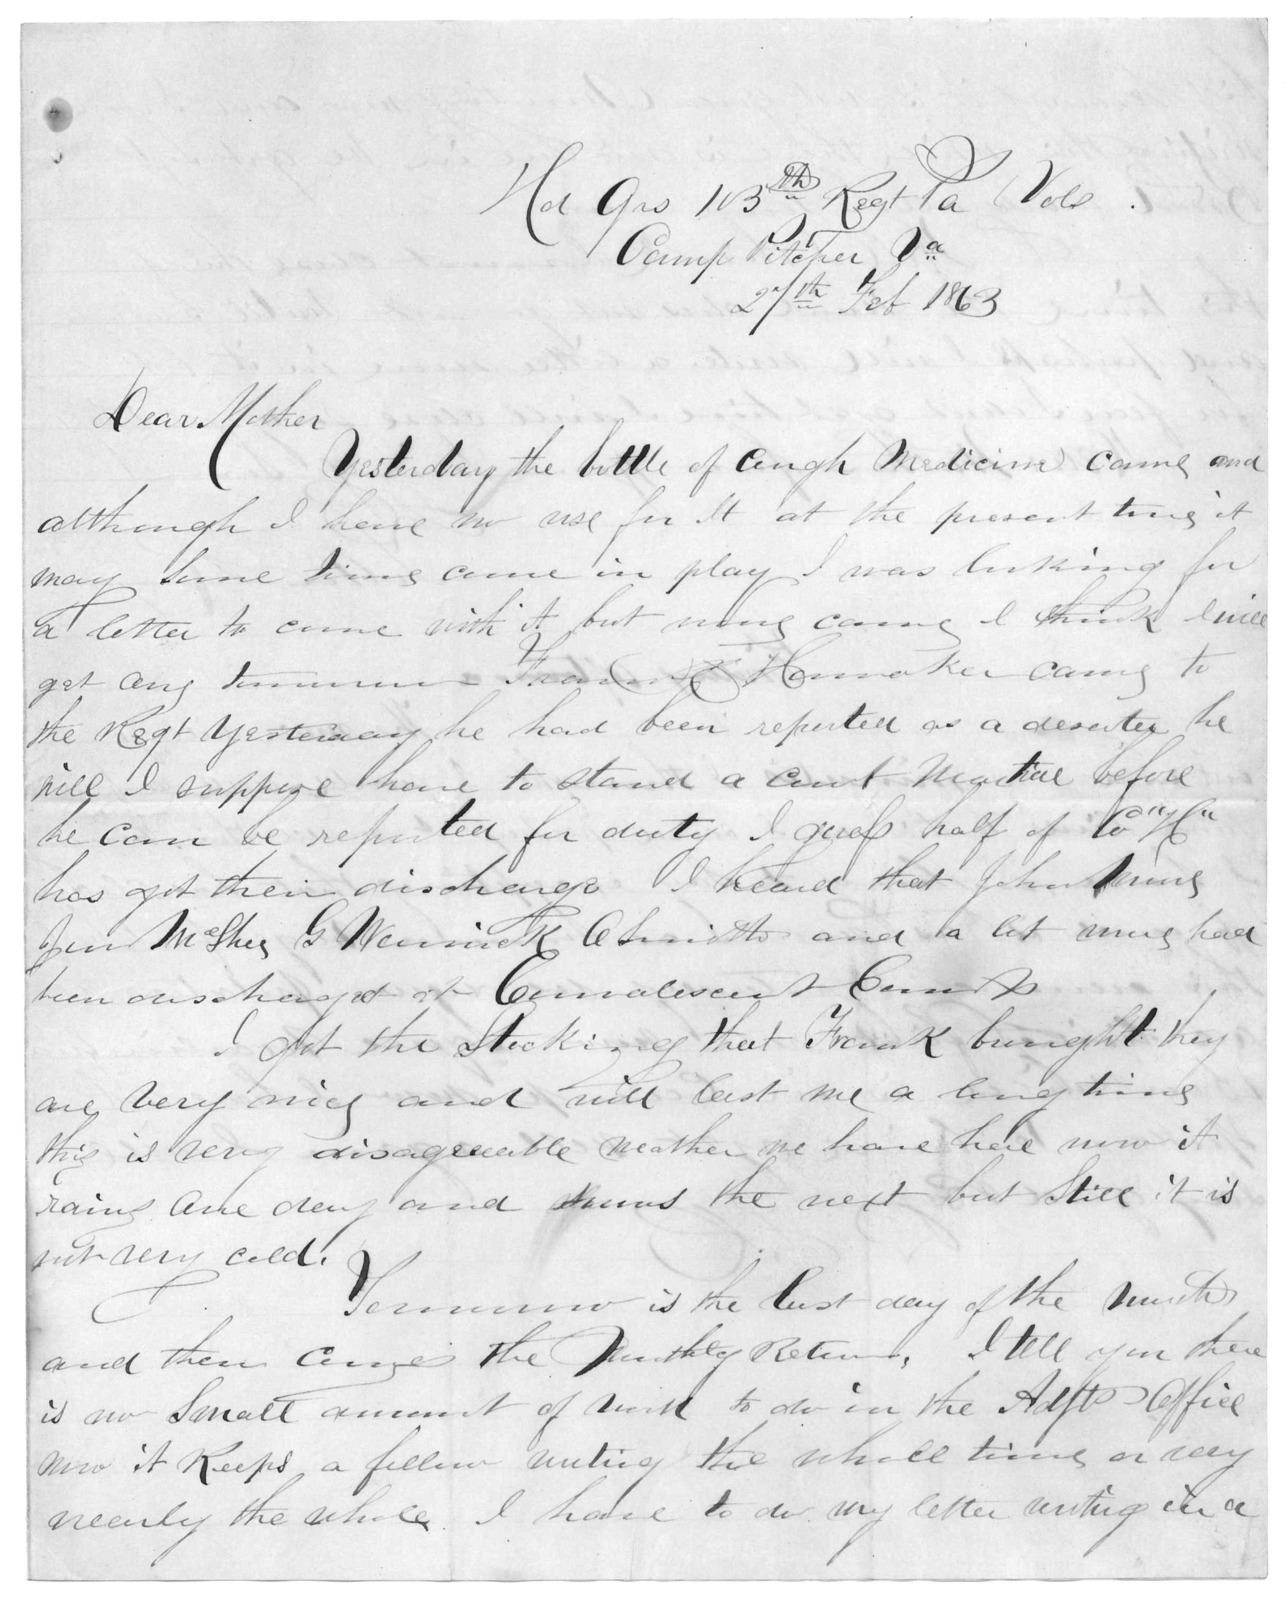 Letter from Tilton C. Reynolds to Juliana Smith Reynolds, February 27, 1863